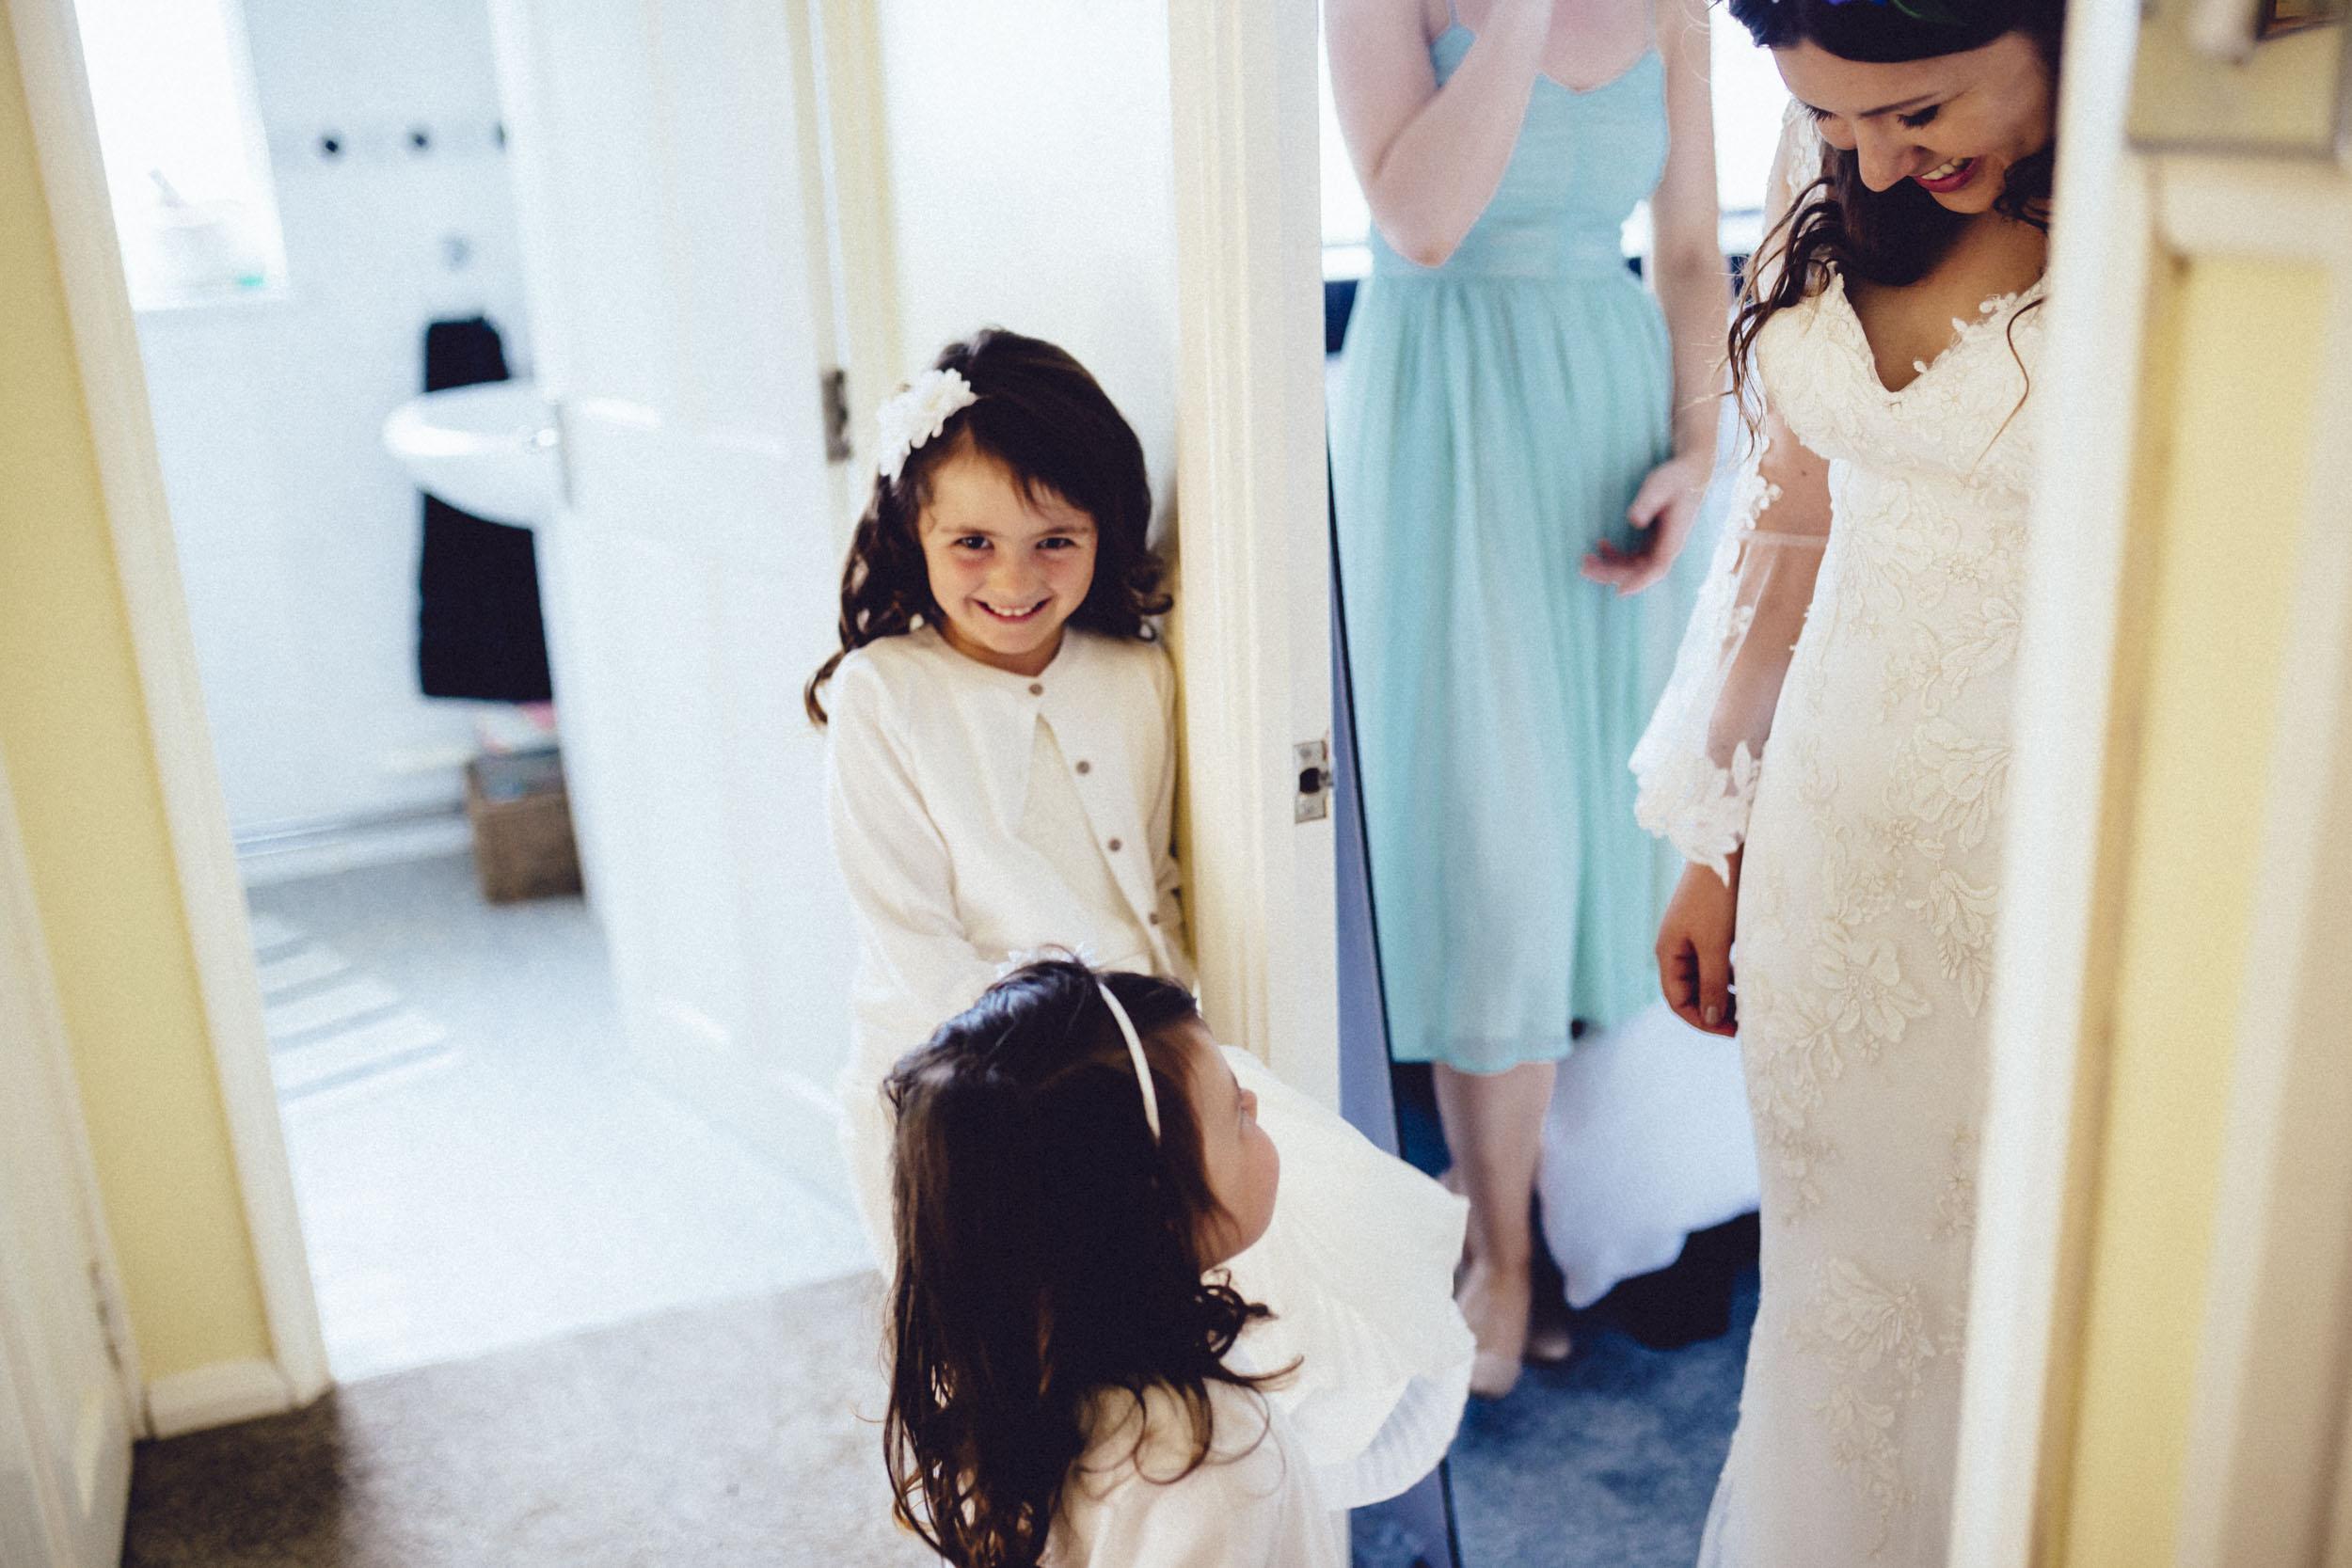 06Curious Rose Wedding Photography- Laura Rhodes- Newton Park Farm- Birmingham Artistic wedding photography- bride- flower girl- lace wedding dress.jpg